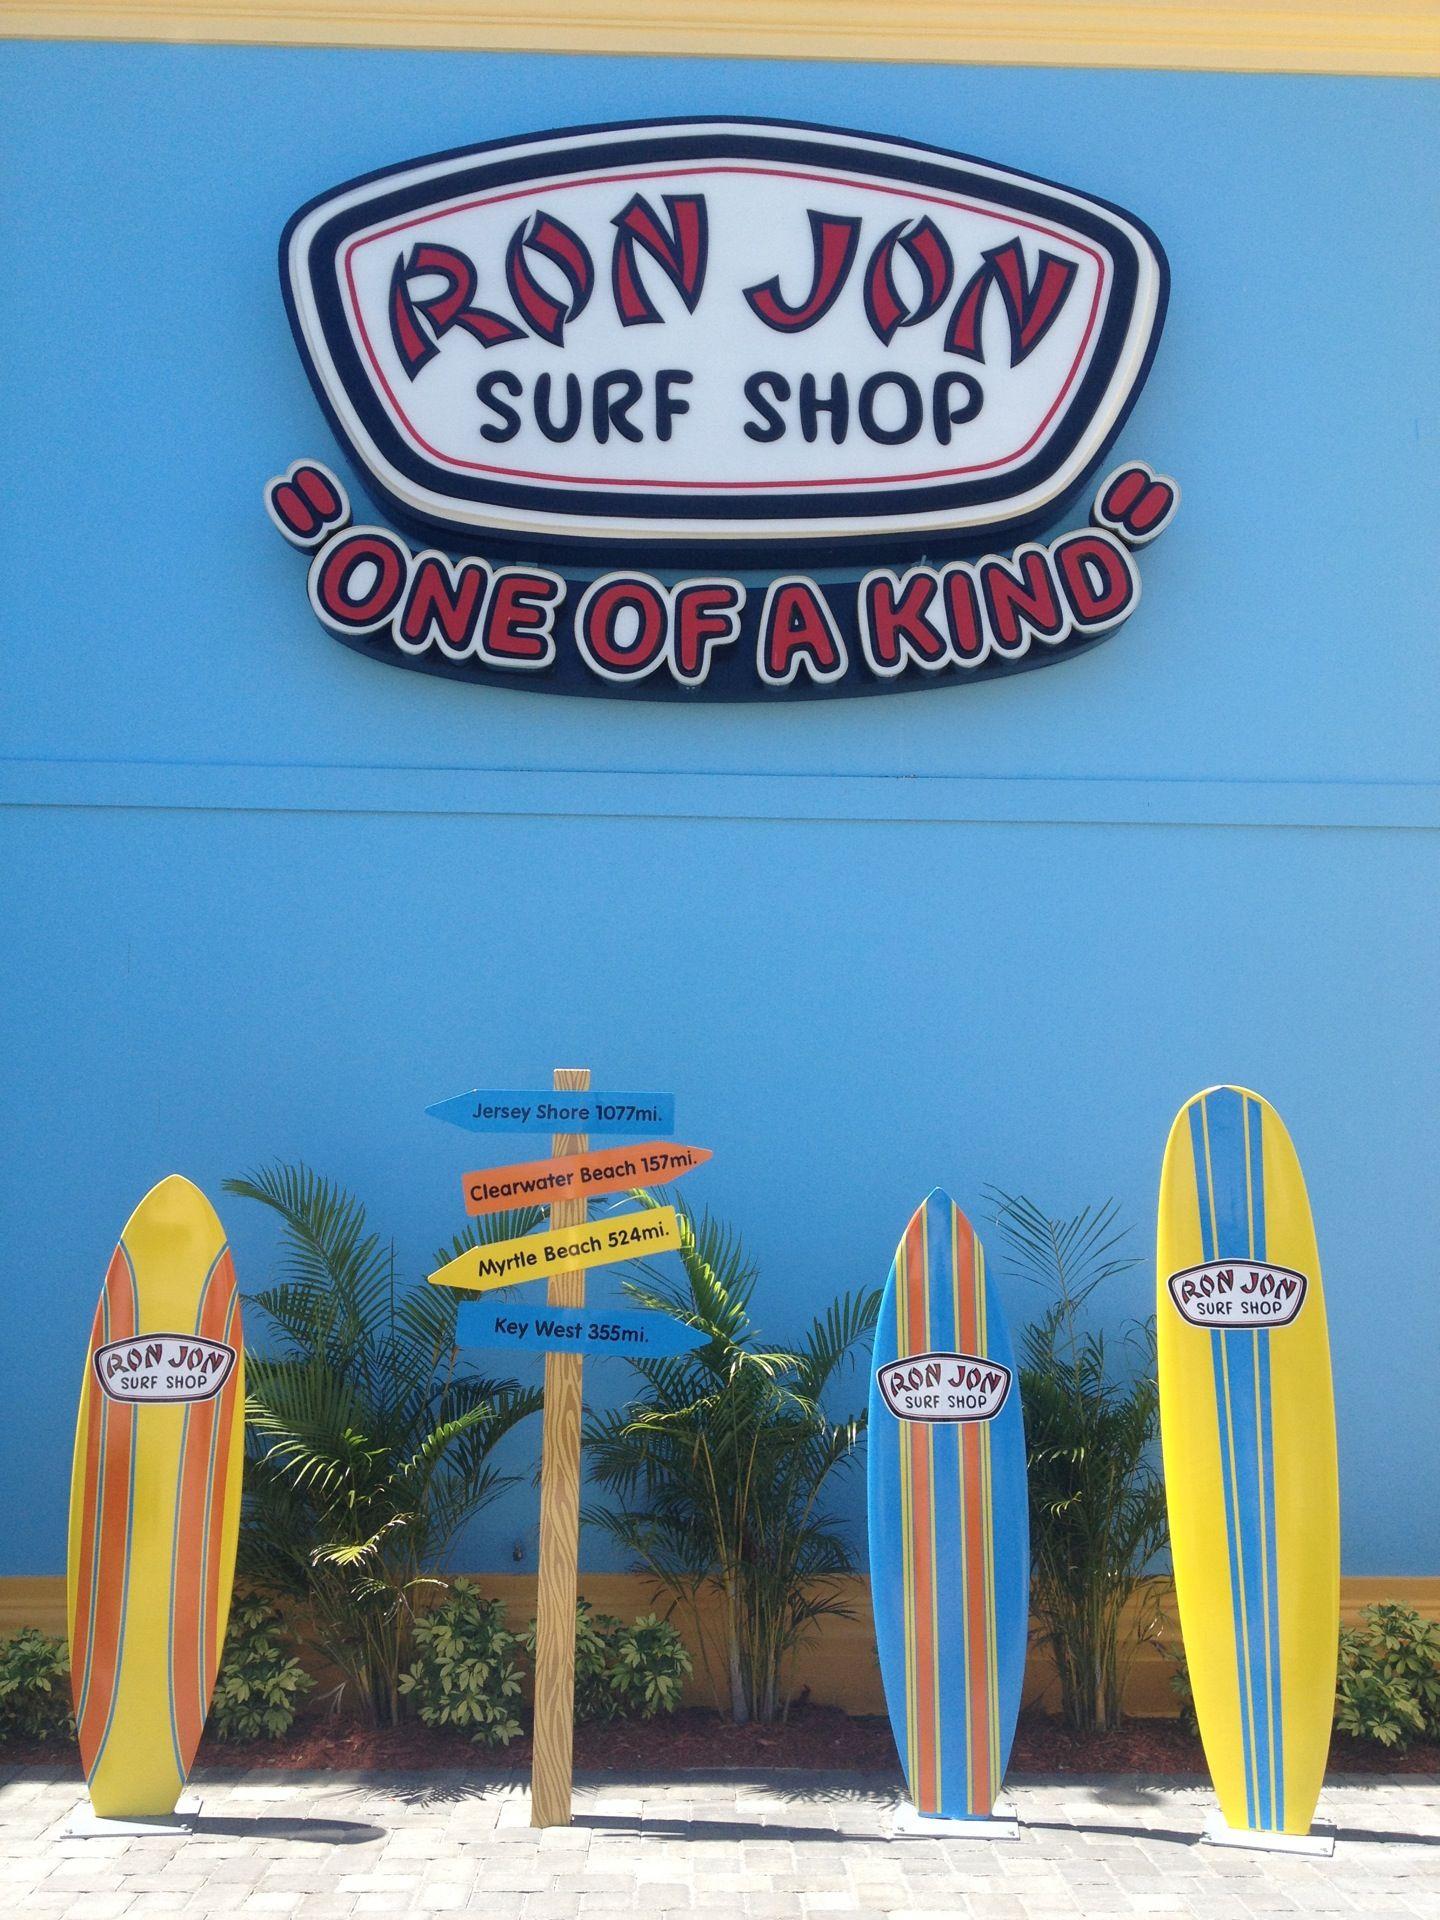 Ron Jon Surf Shop in Cocoa Beach 6d6c47c6636